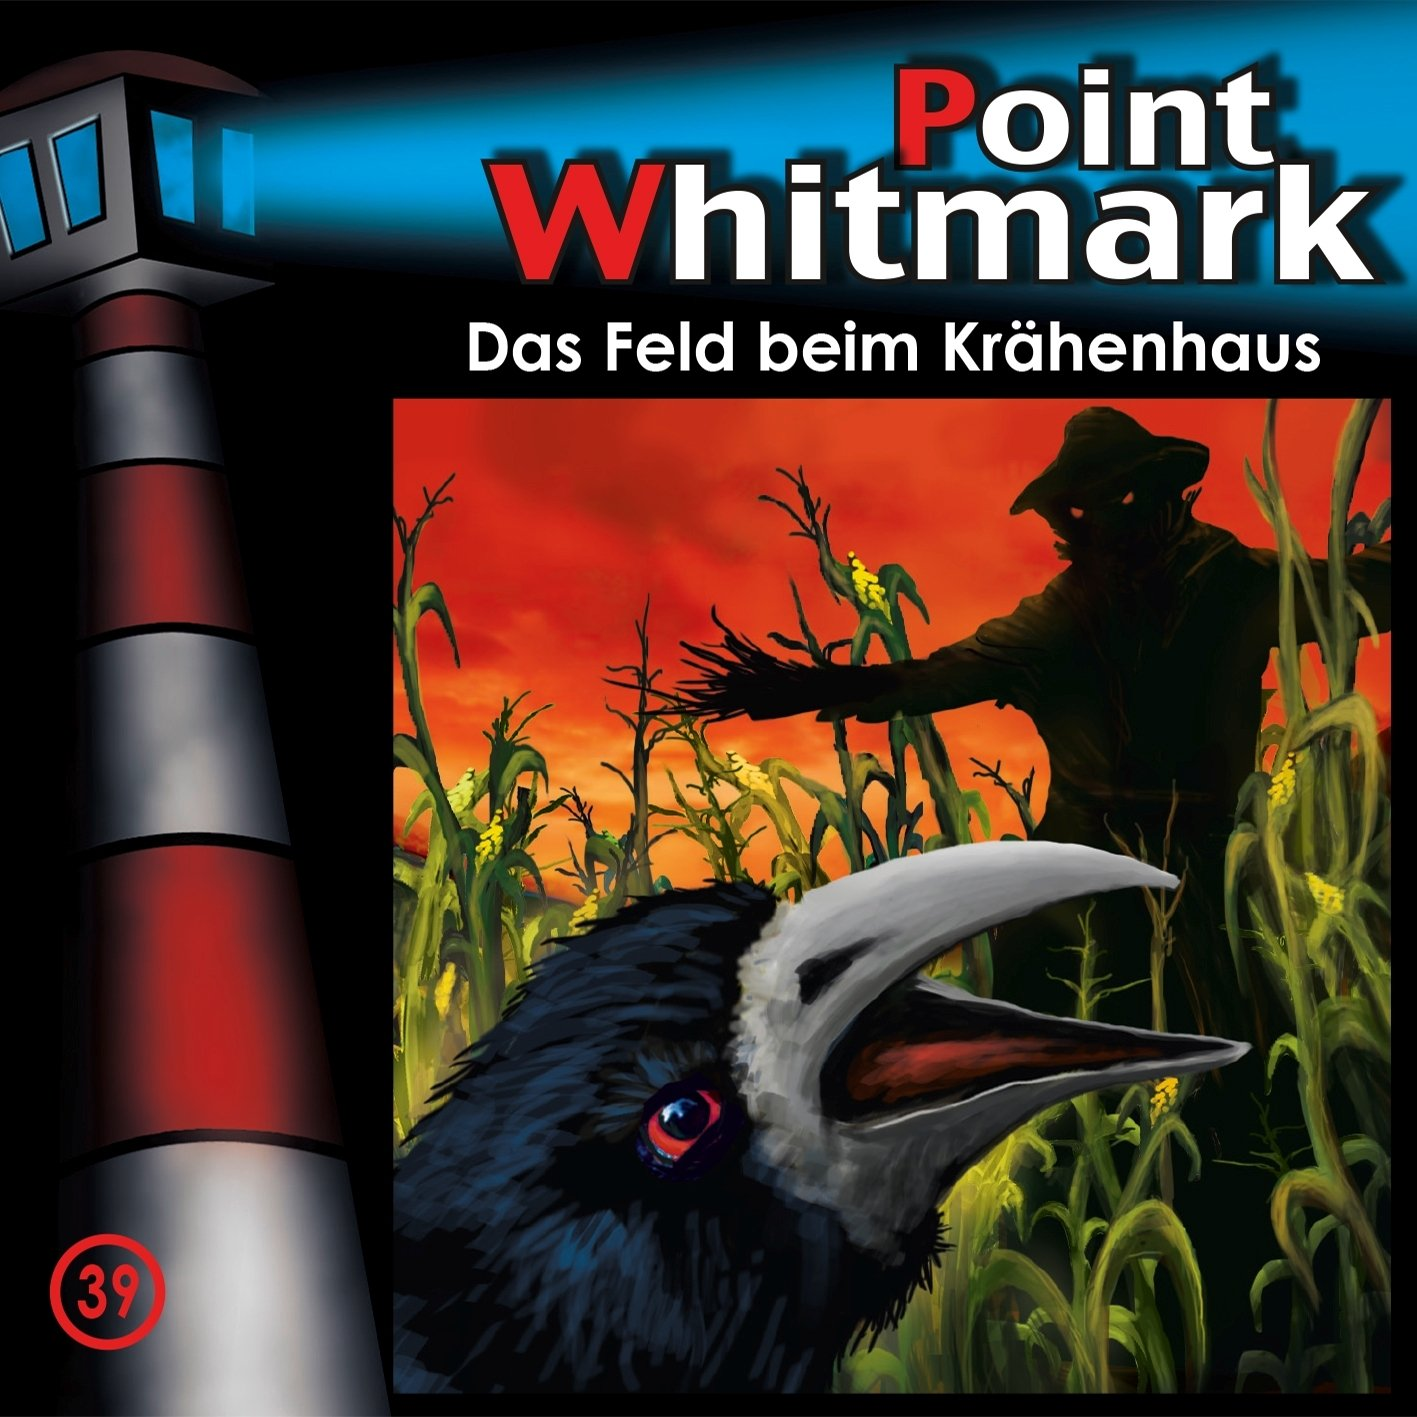 Point Whitmark (39) Das Feld beim Krähenhaus (Decision)